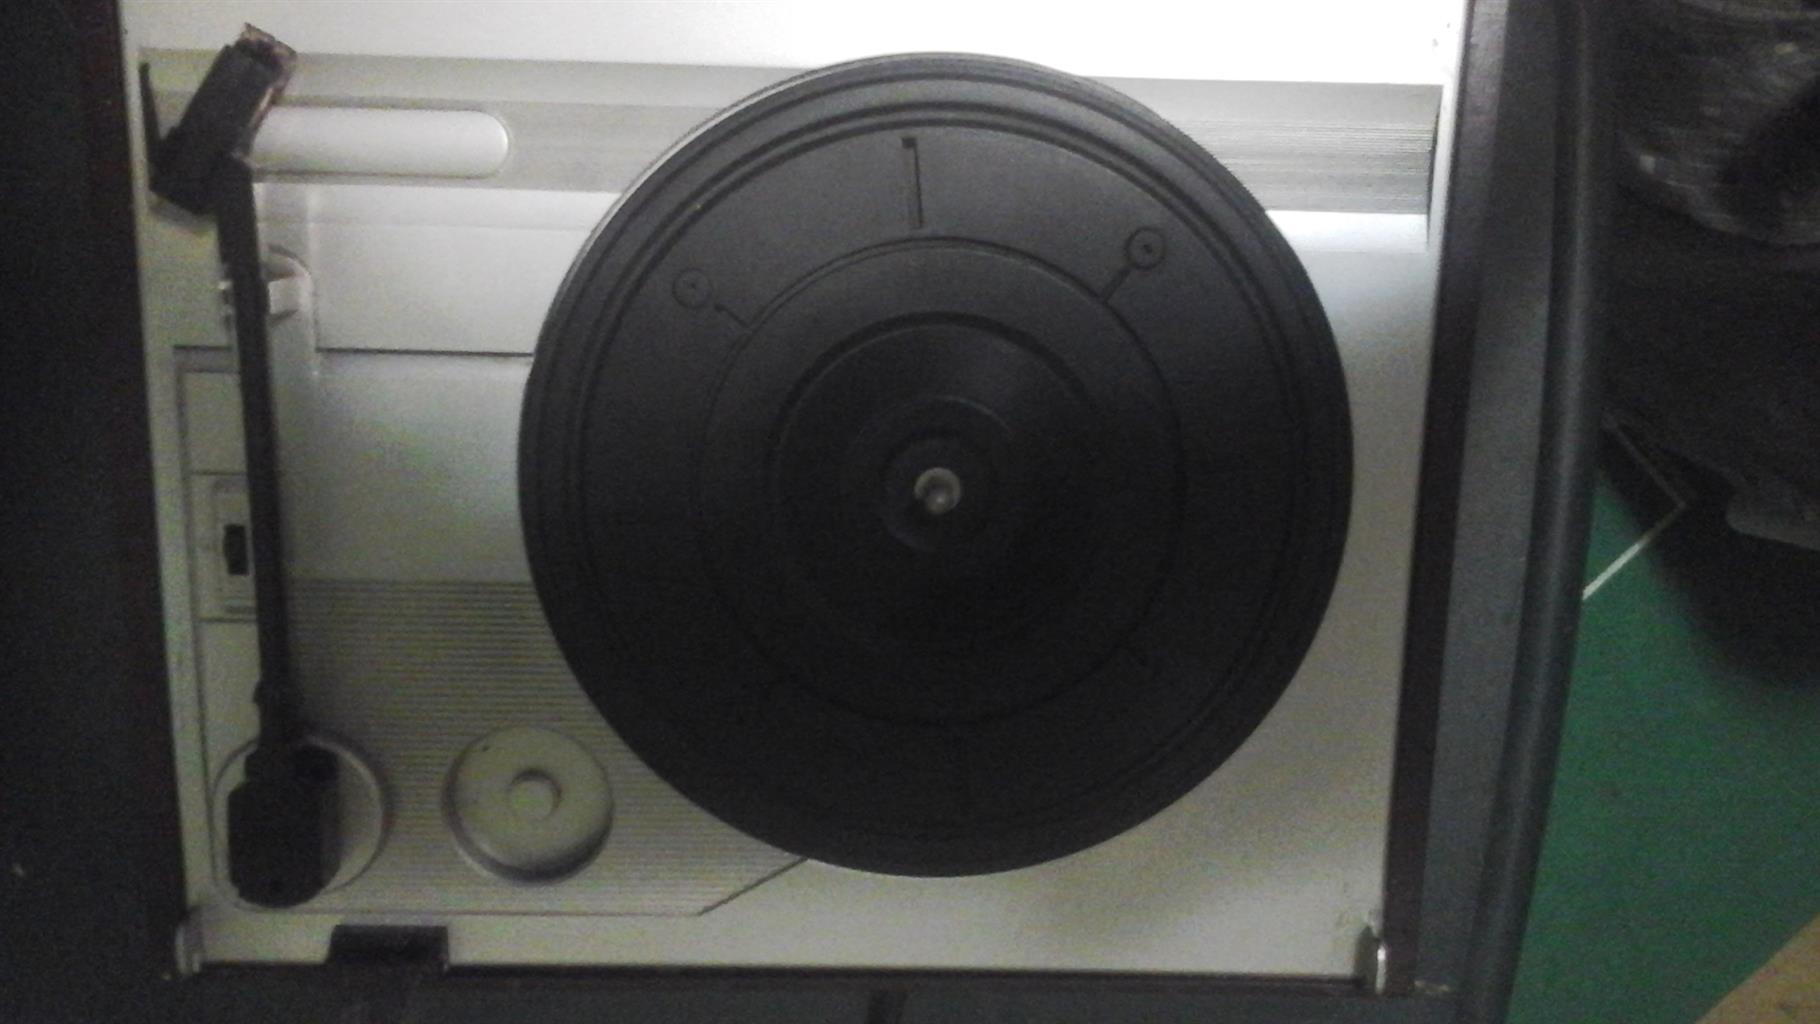 Diamond radio with CD and turntable